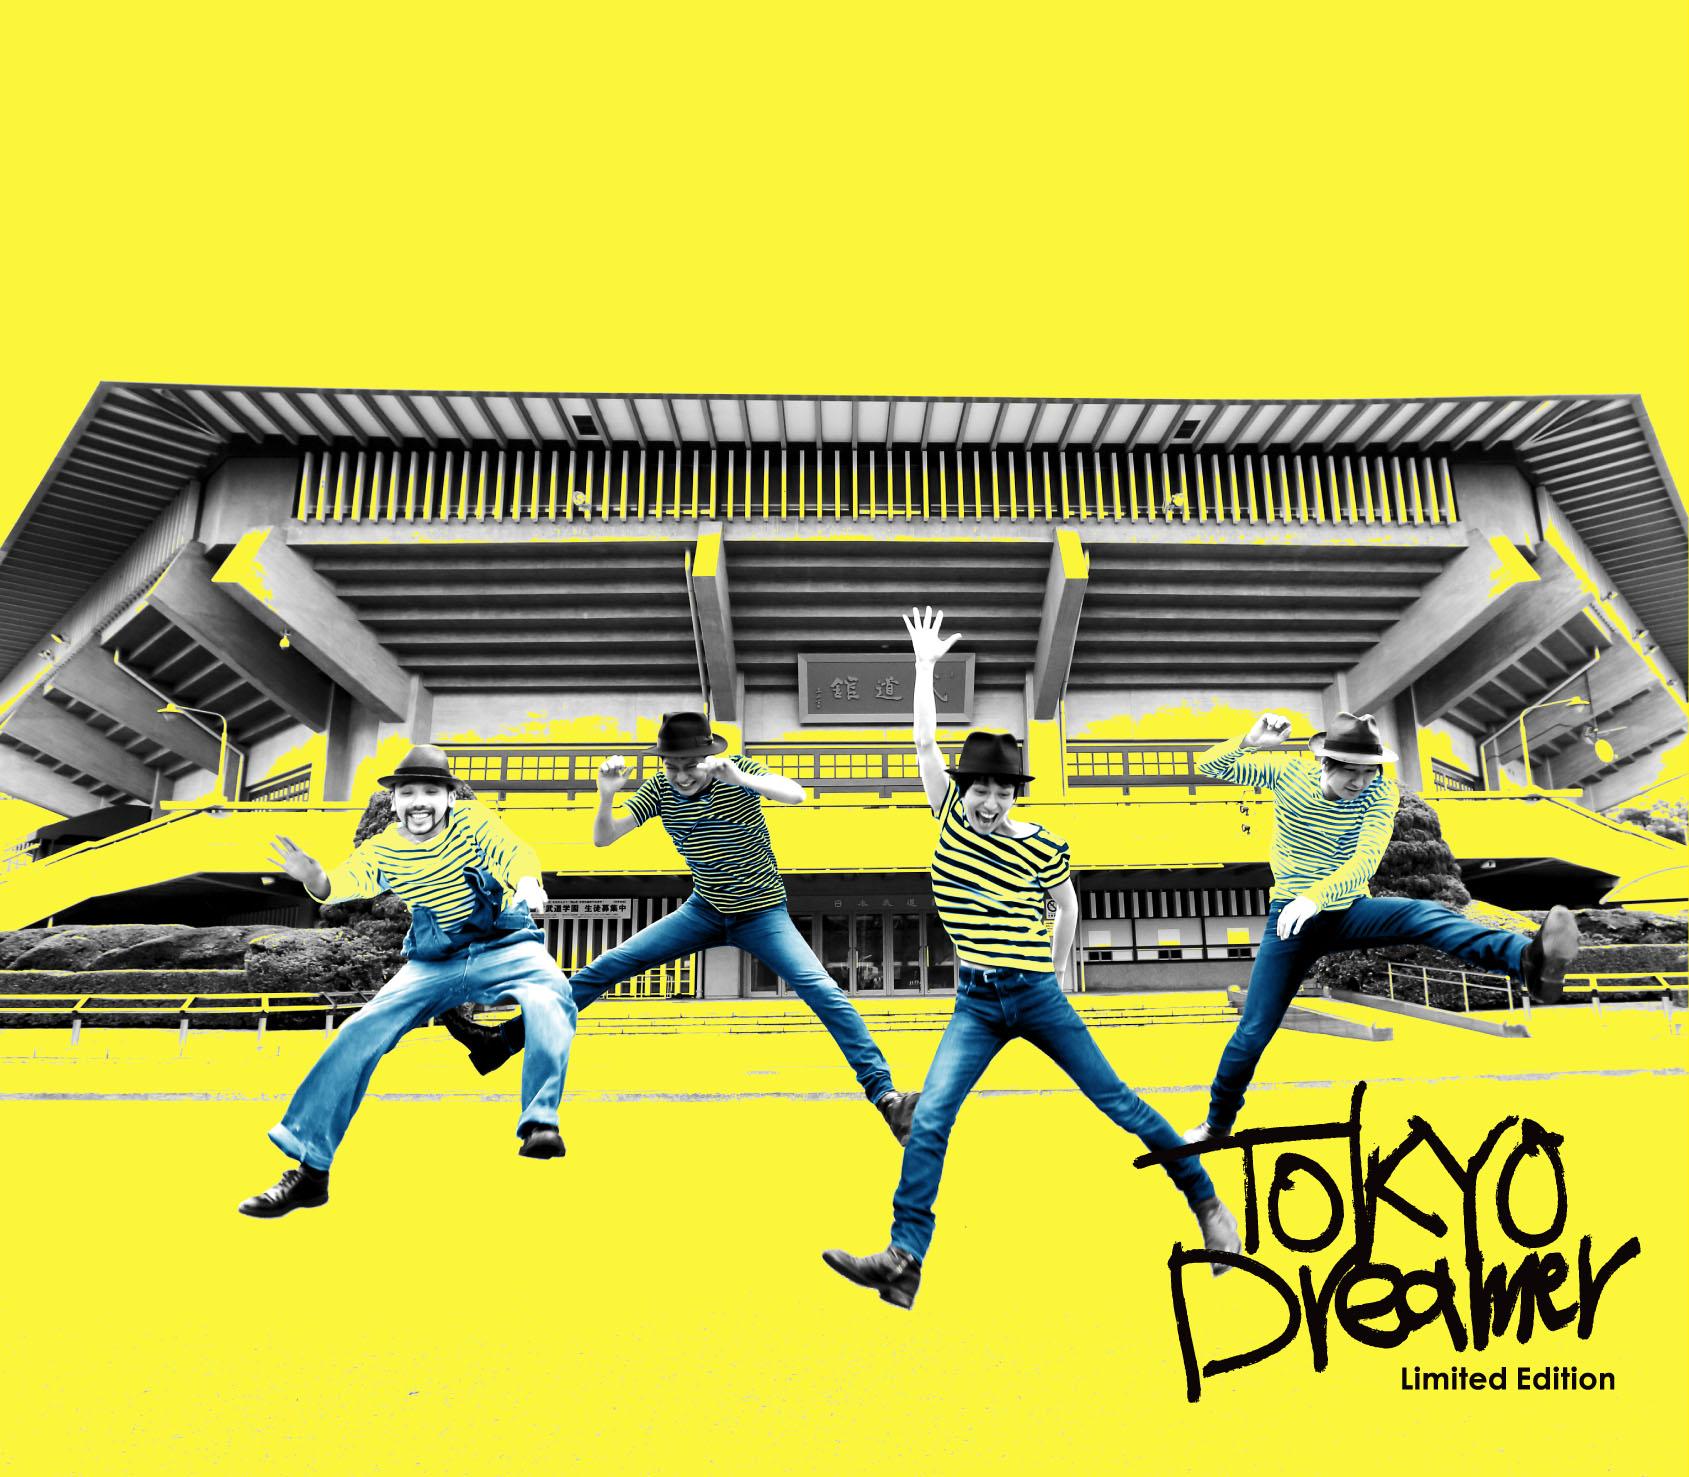 「TOKYO Dreamer」武道館会場限定スリーブジャケット(光村龍哉)